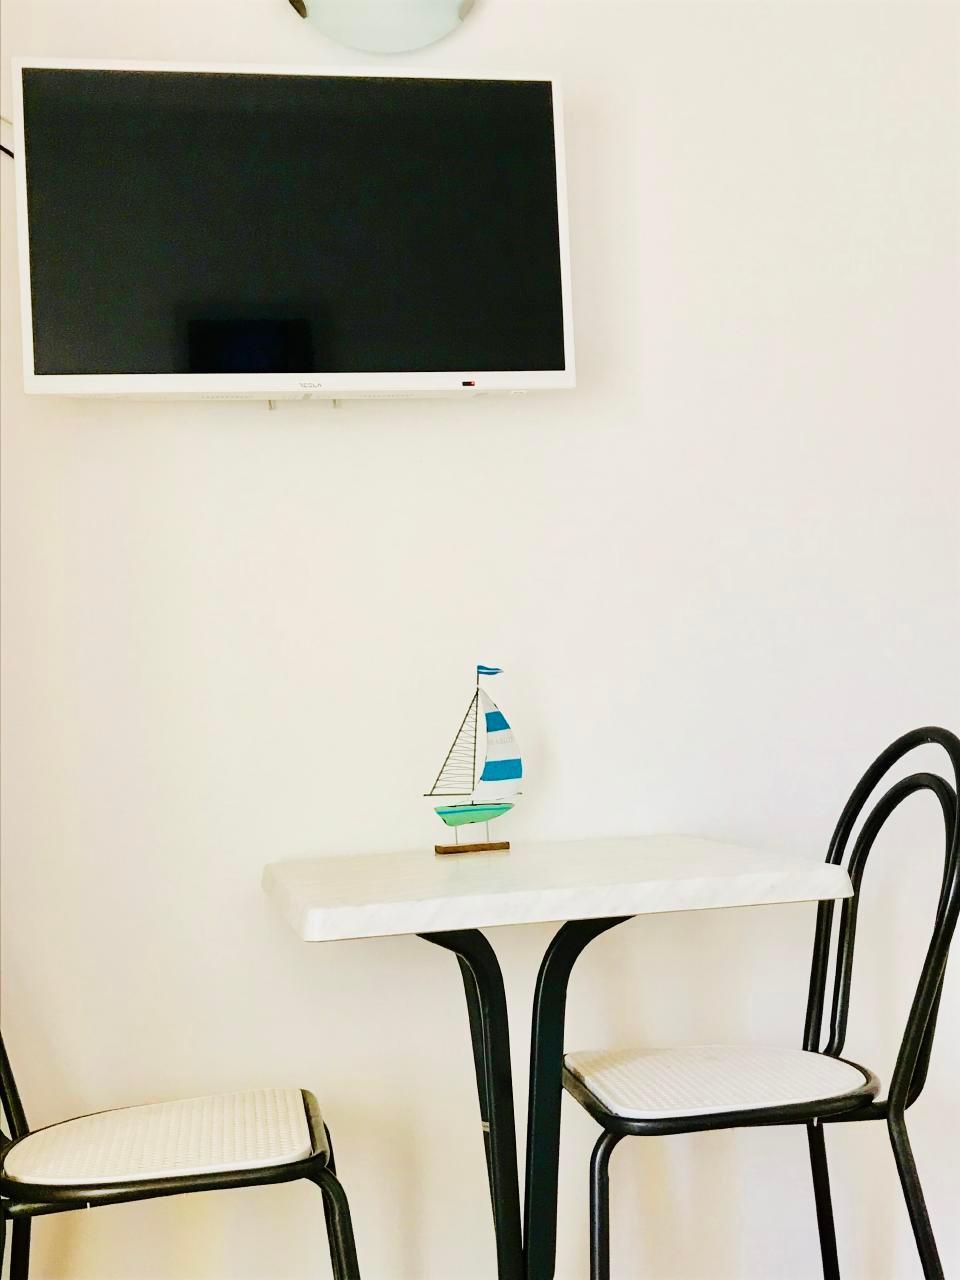 Ferienwohnung Apartmenthaus Ruza 1 - Studio (98389), Kaštel Štafilić, , Dalmatien, Kroatien, Bild 9